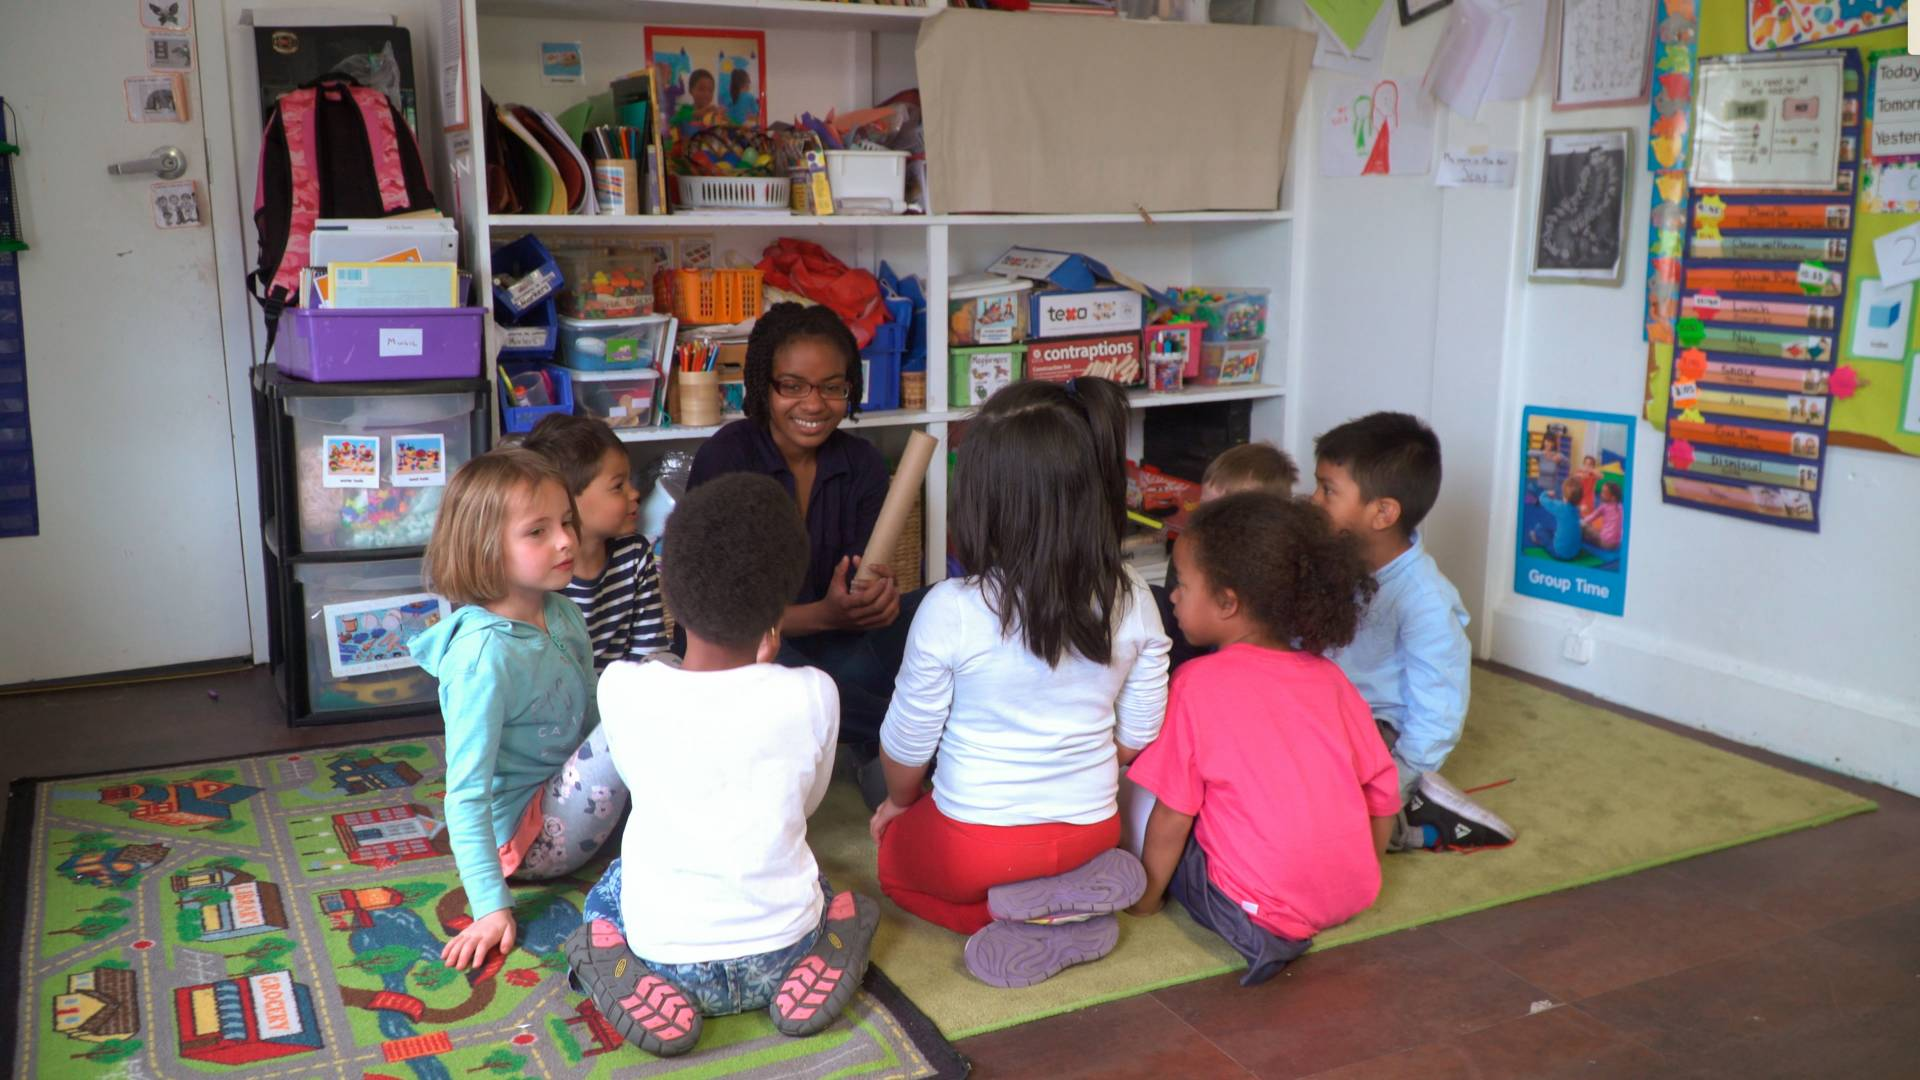 Princeton Profiles Jazmyn Blackburn Dedicated To Service Through Education